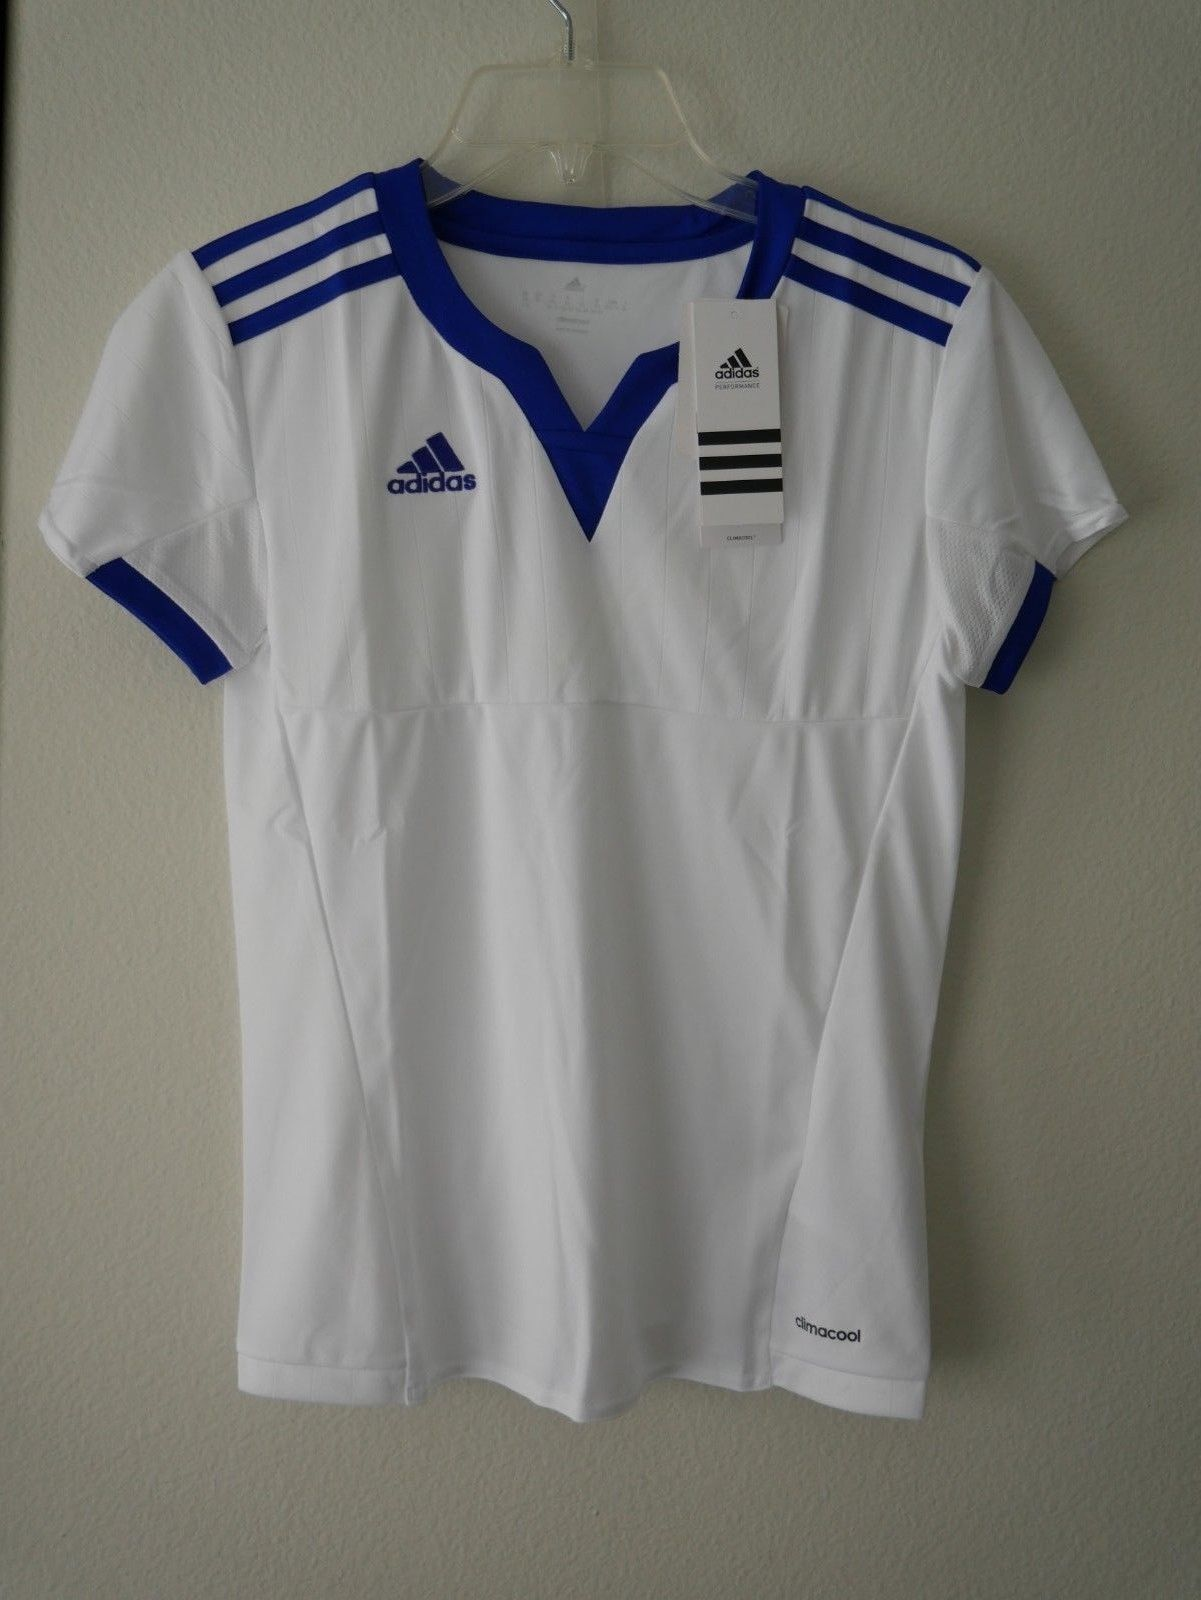 ddc62d96e 57. 57. Previous. Adidas Performance Soccer Womens Climacool Tiro 15 Jersey  ...